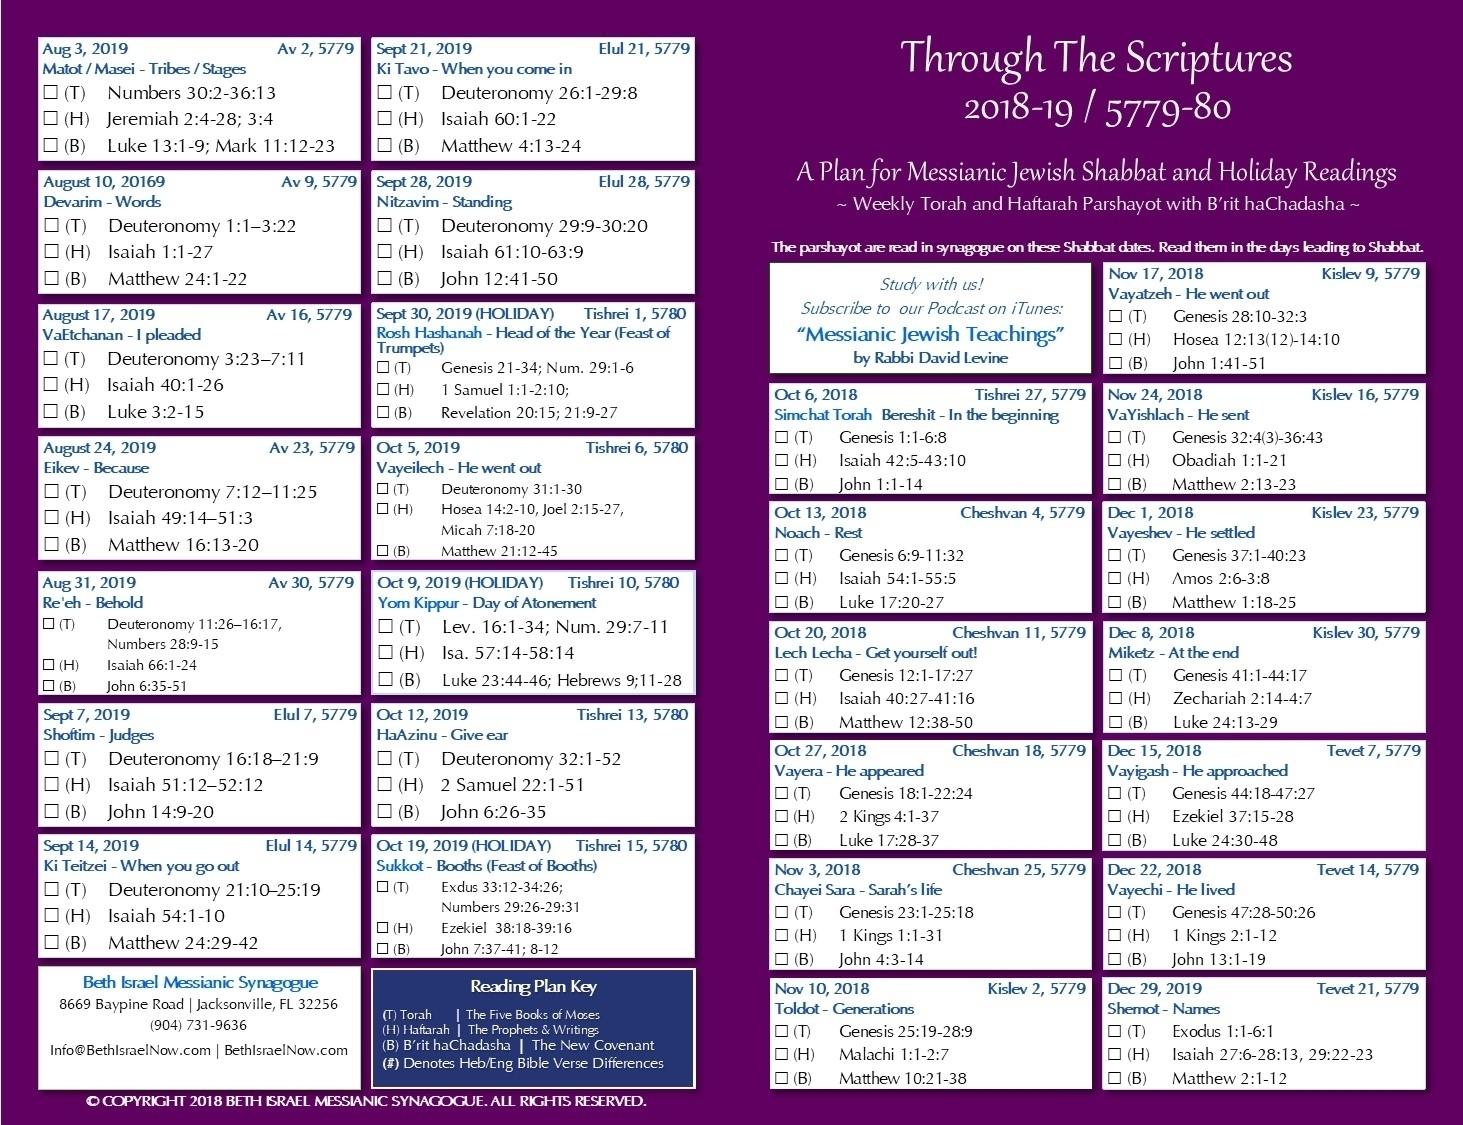 Weekly Torah Parsha Calendar For 2019/2020 - Calendar pertaining to 2019 Calendar Of Torah Portions